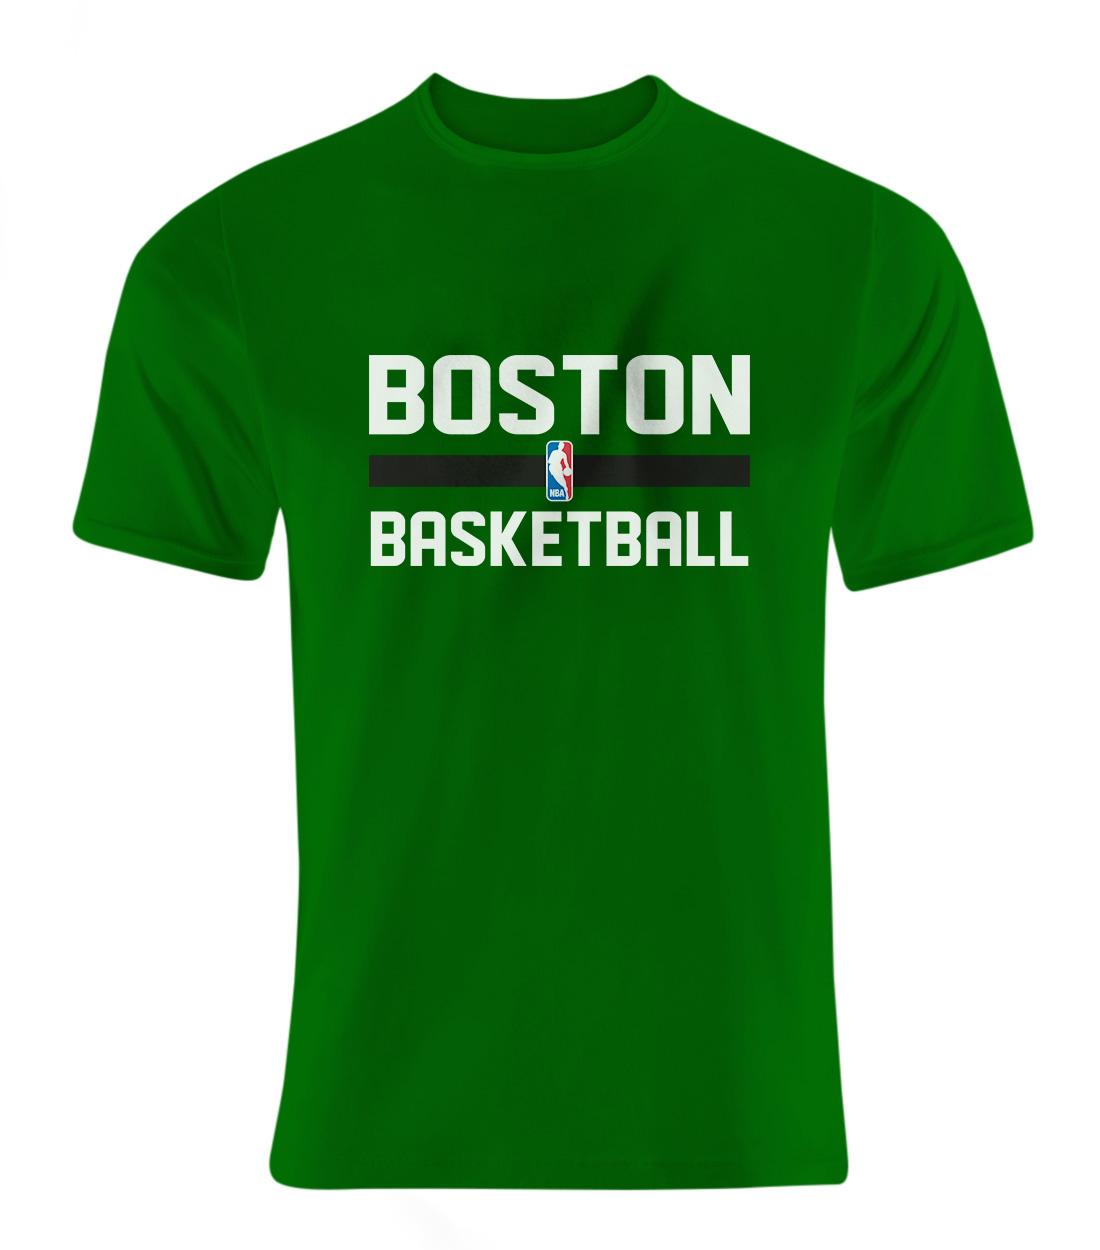 Boston Basketball Tshirt (out-TSH-GRN-33-NBA-BSTN-BASKETBALL)